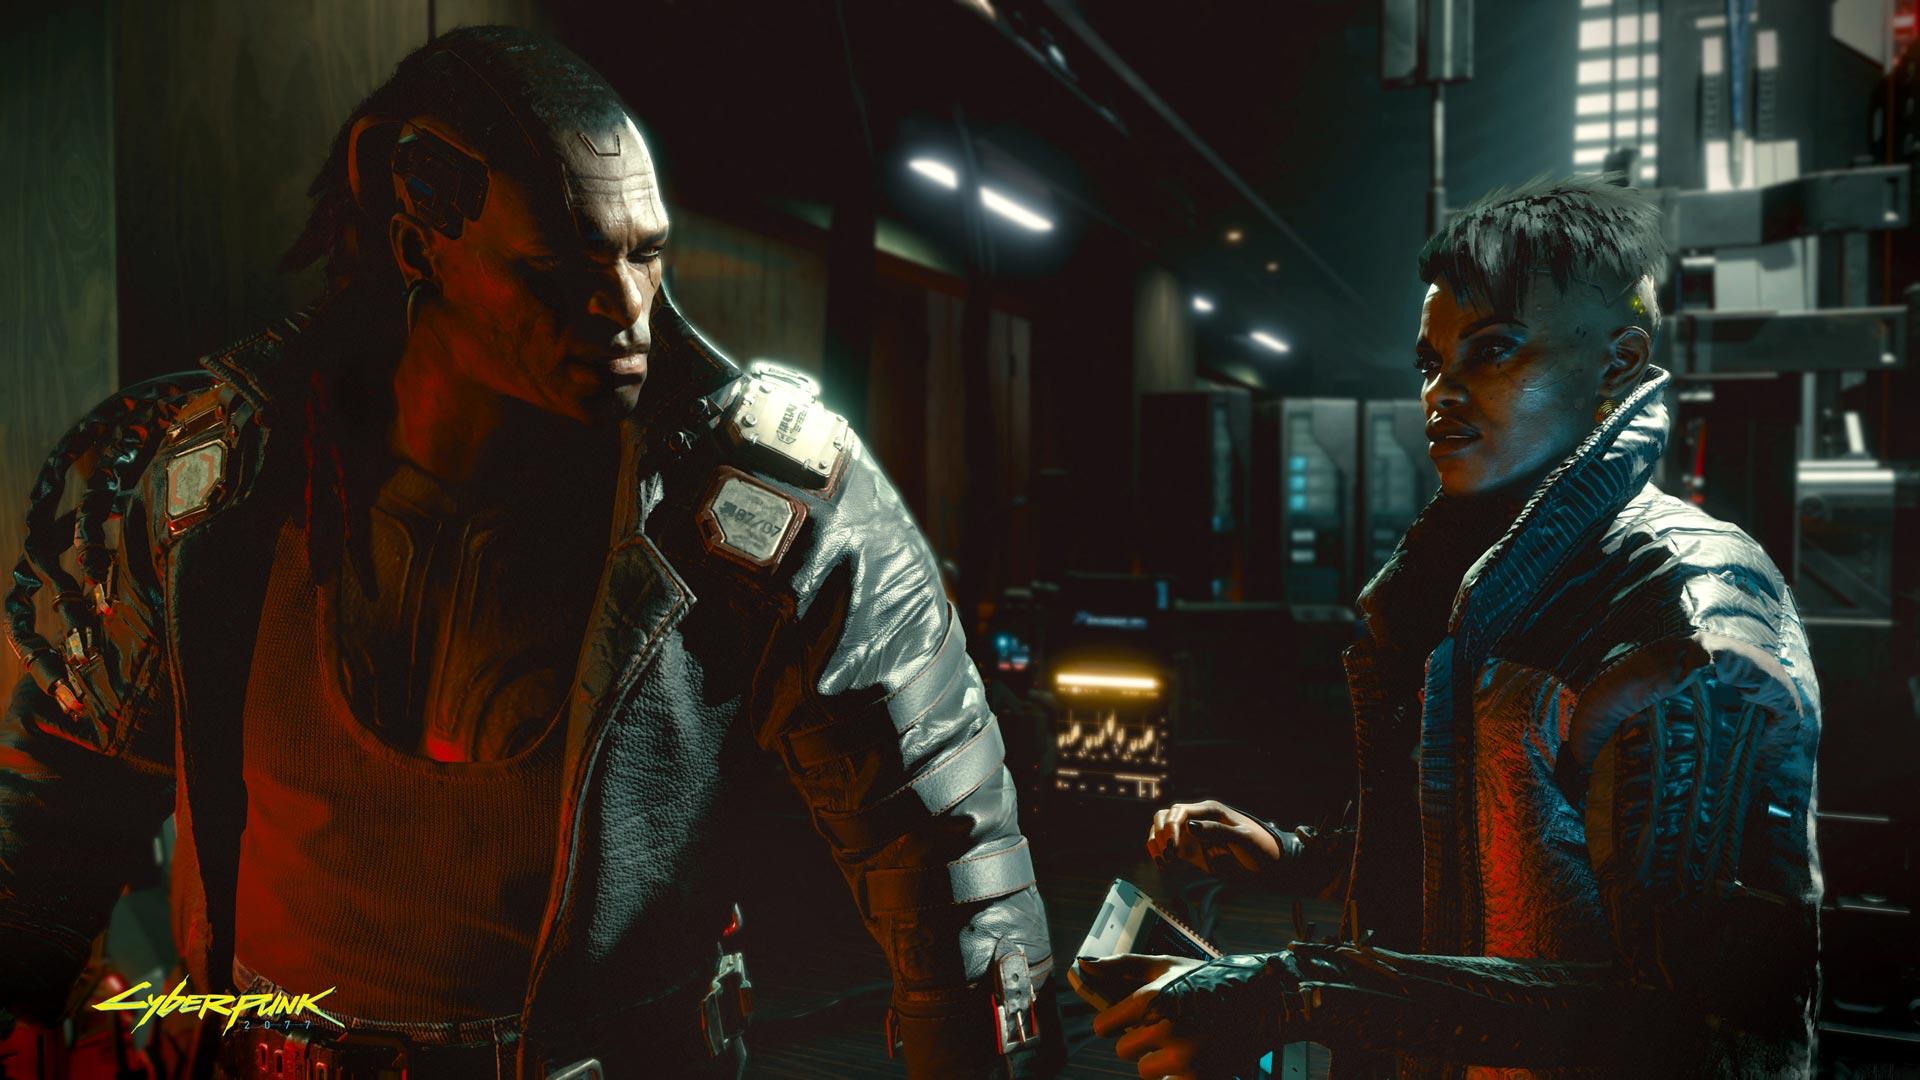 Cyberpunk 2077 Multiplayer characters